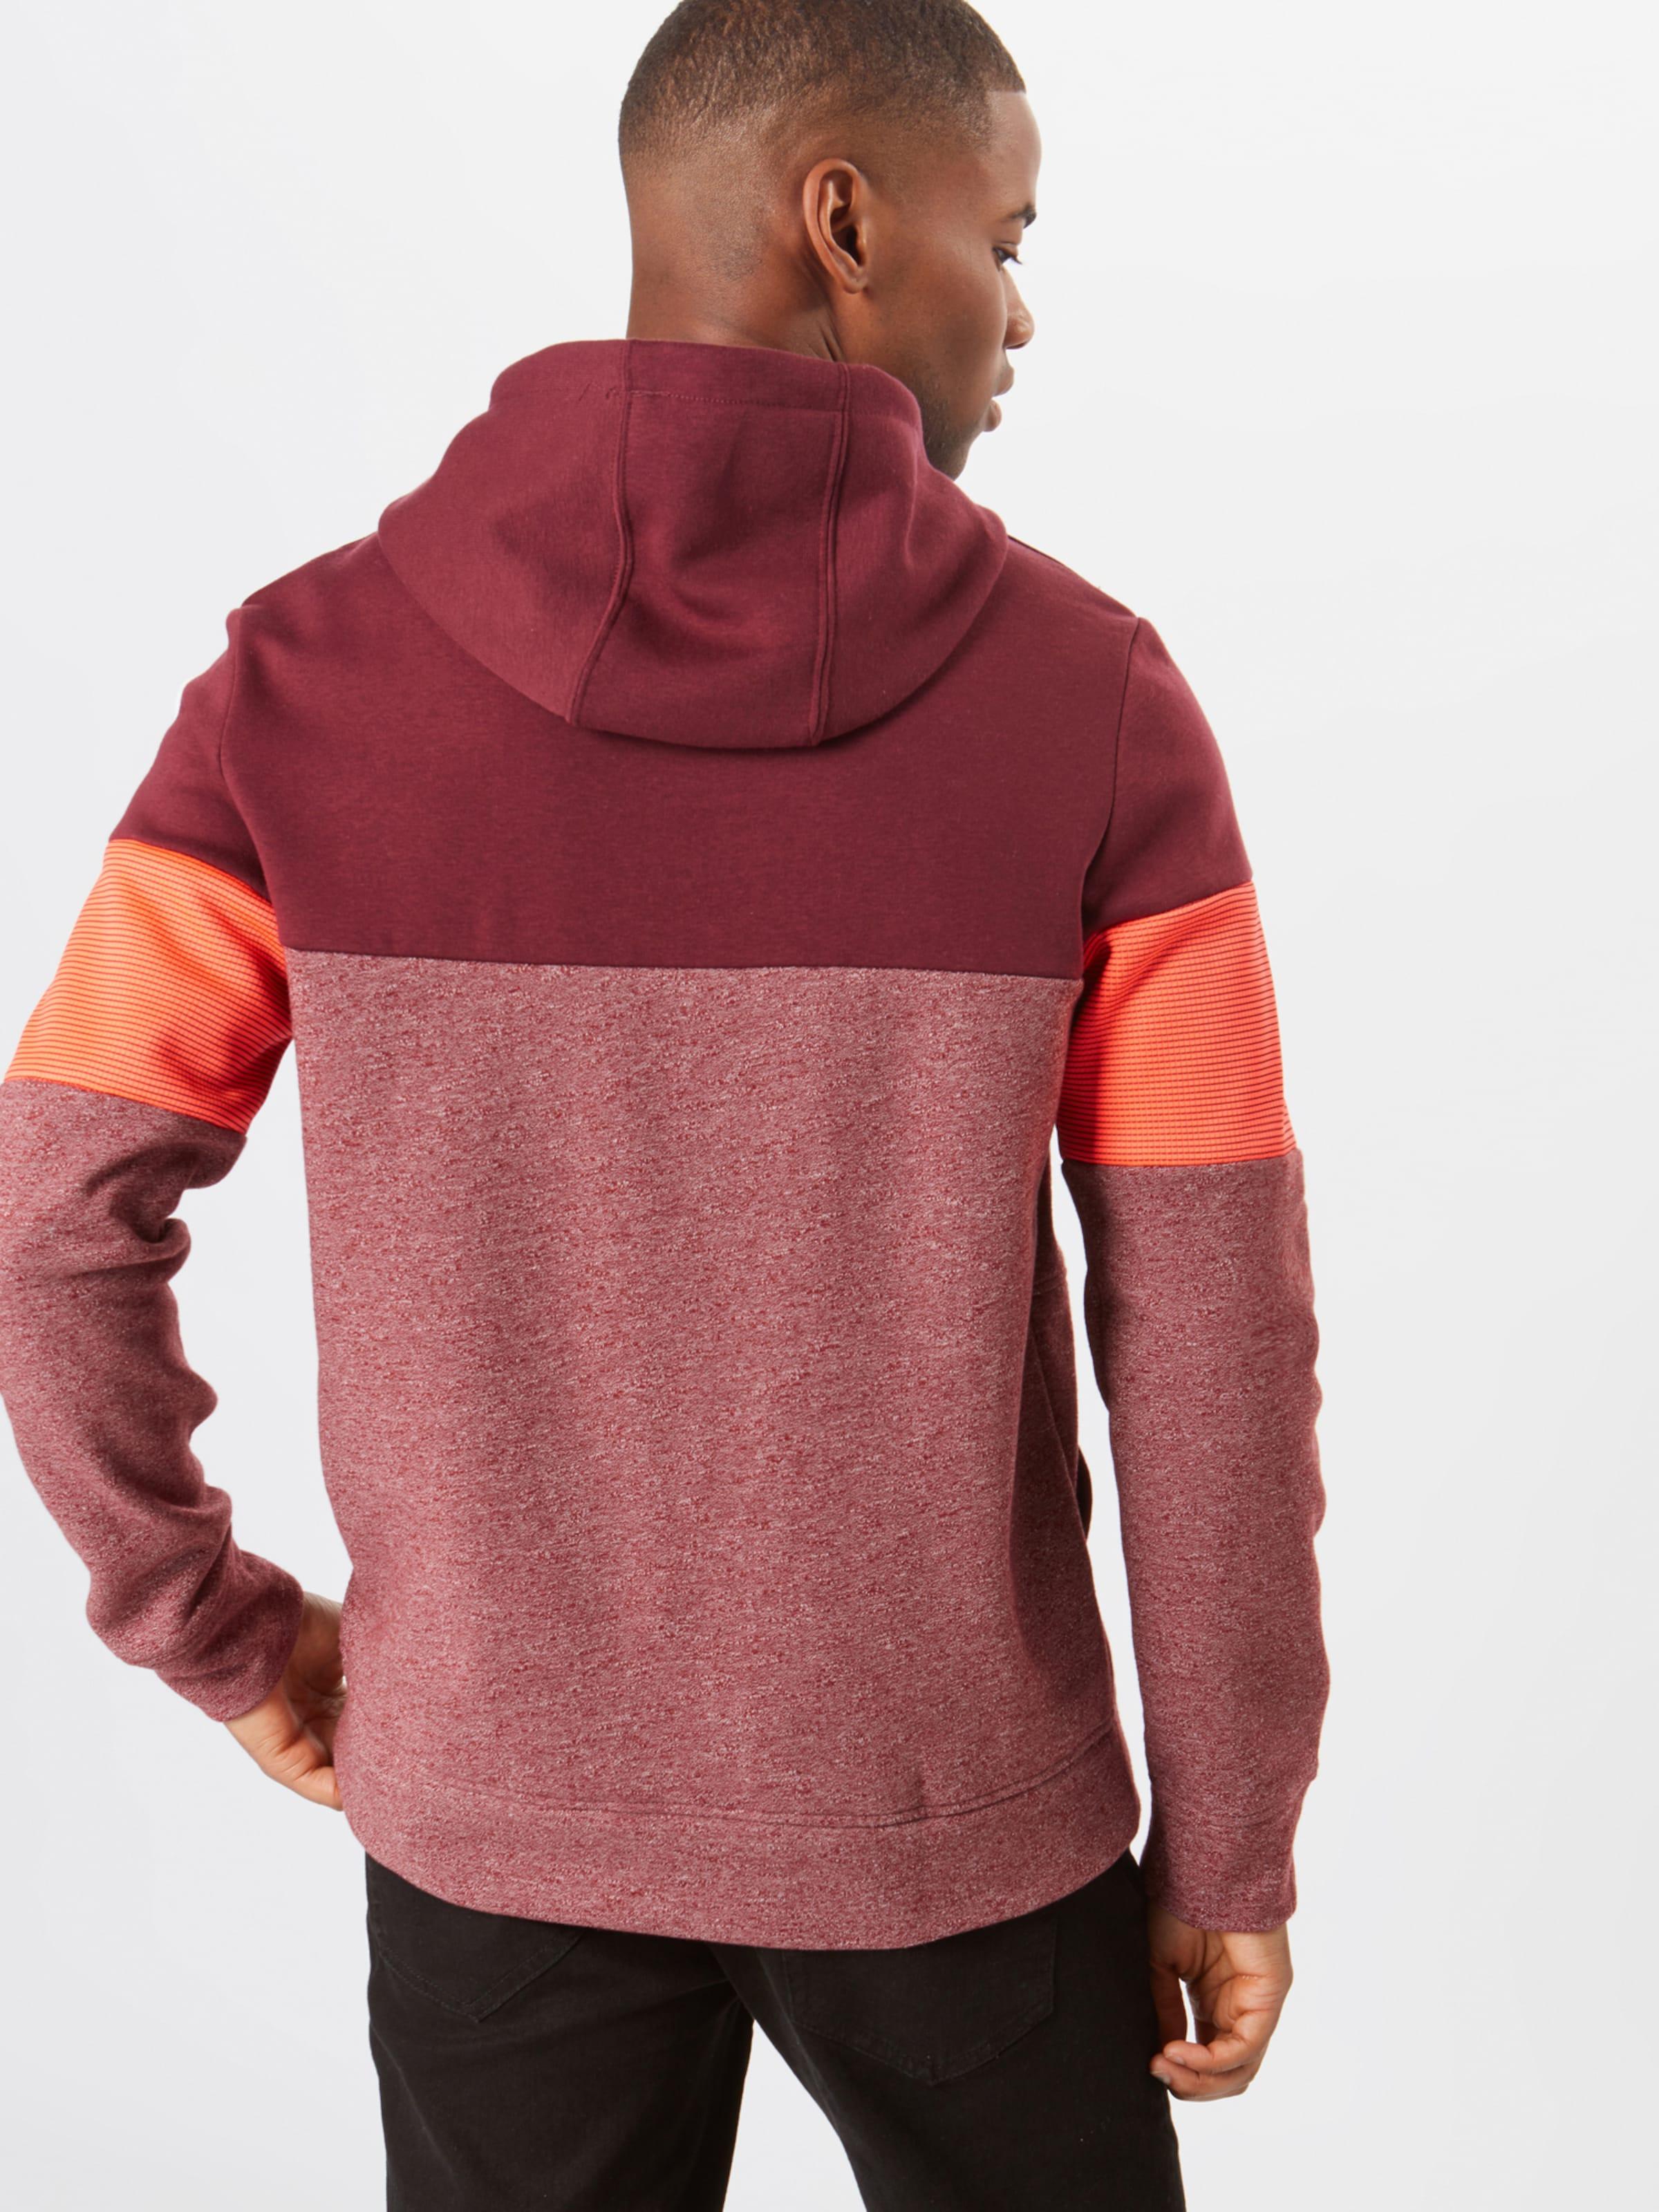 shirt En Jackamp; Vert Jones JauneGris Chiné Foncé Sweat FJ1Klc